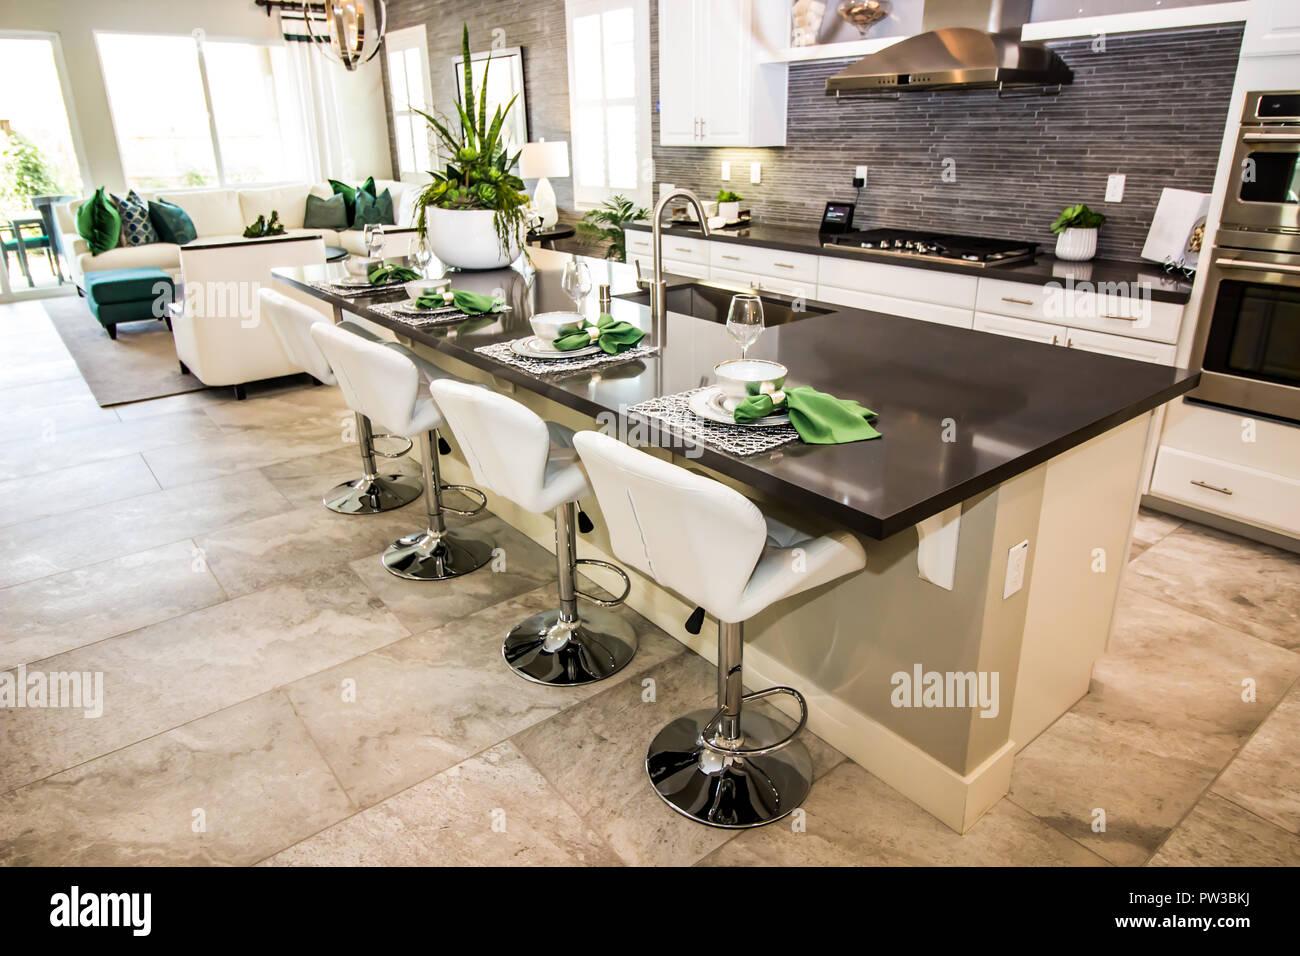 Cucina moderna con isola counter bar e sgabelli foto & immagine